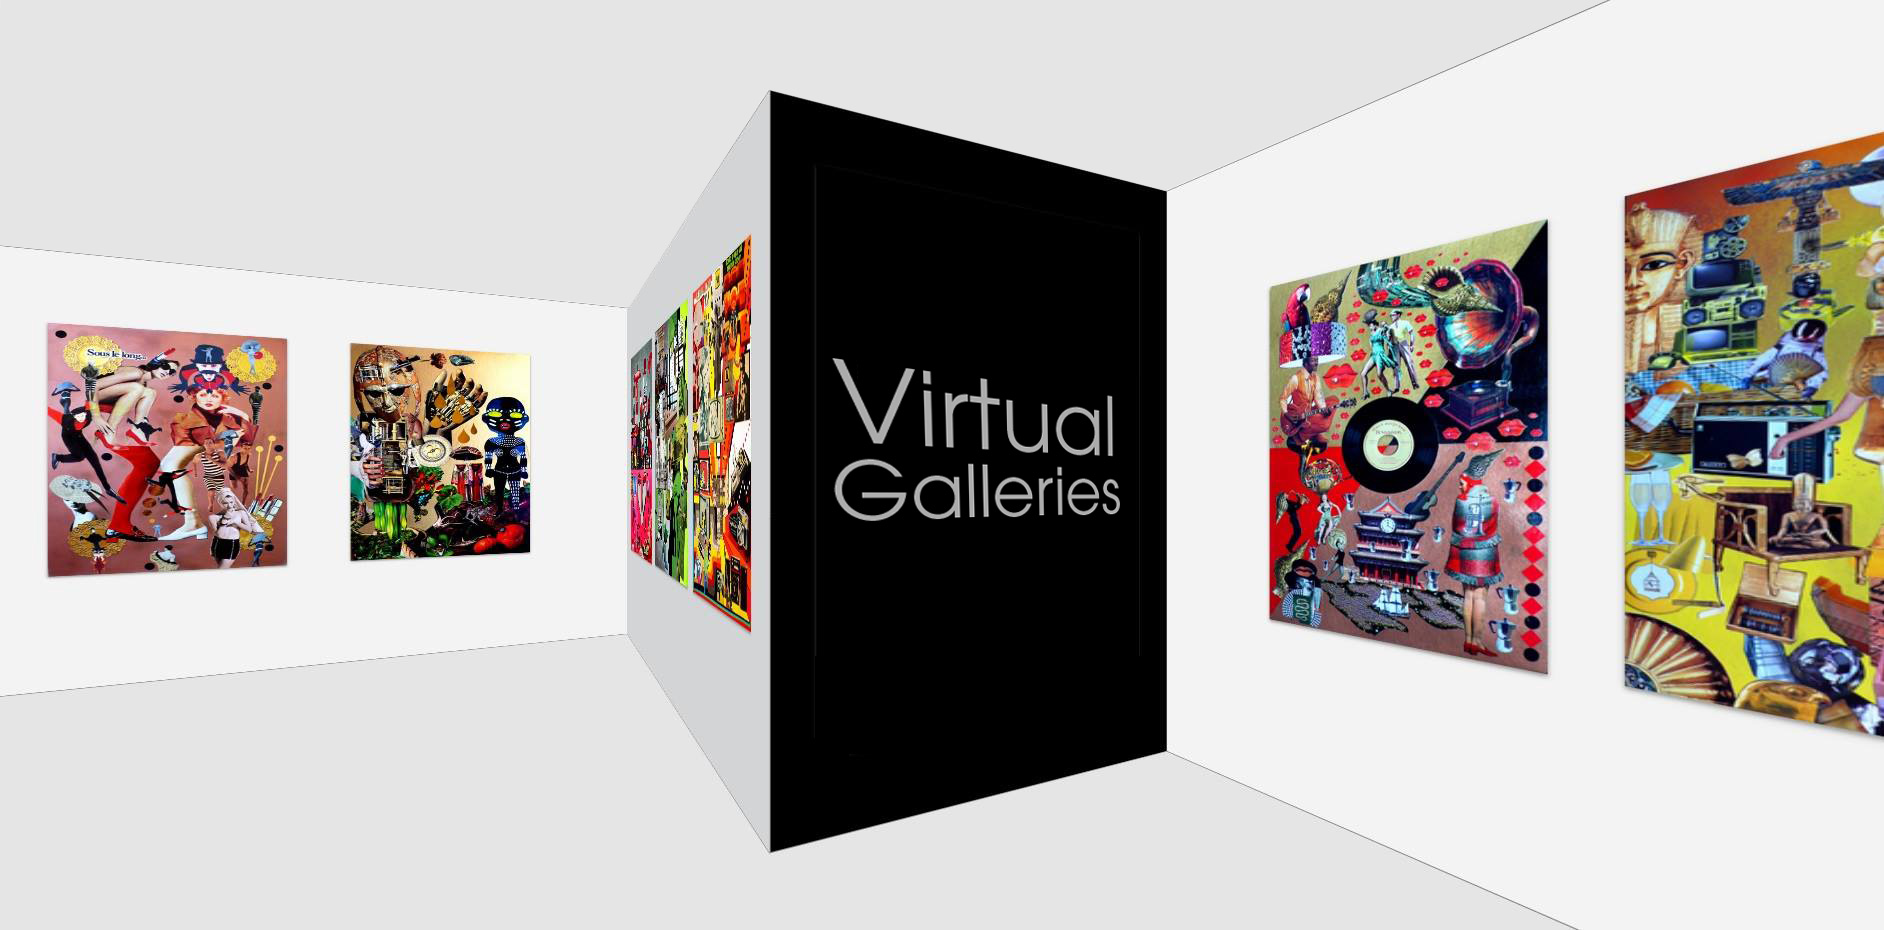 Galerias Virtuales De Arte Online Razgo